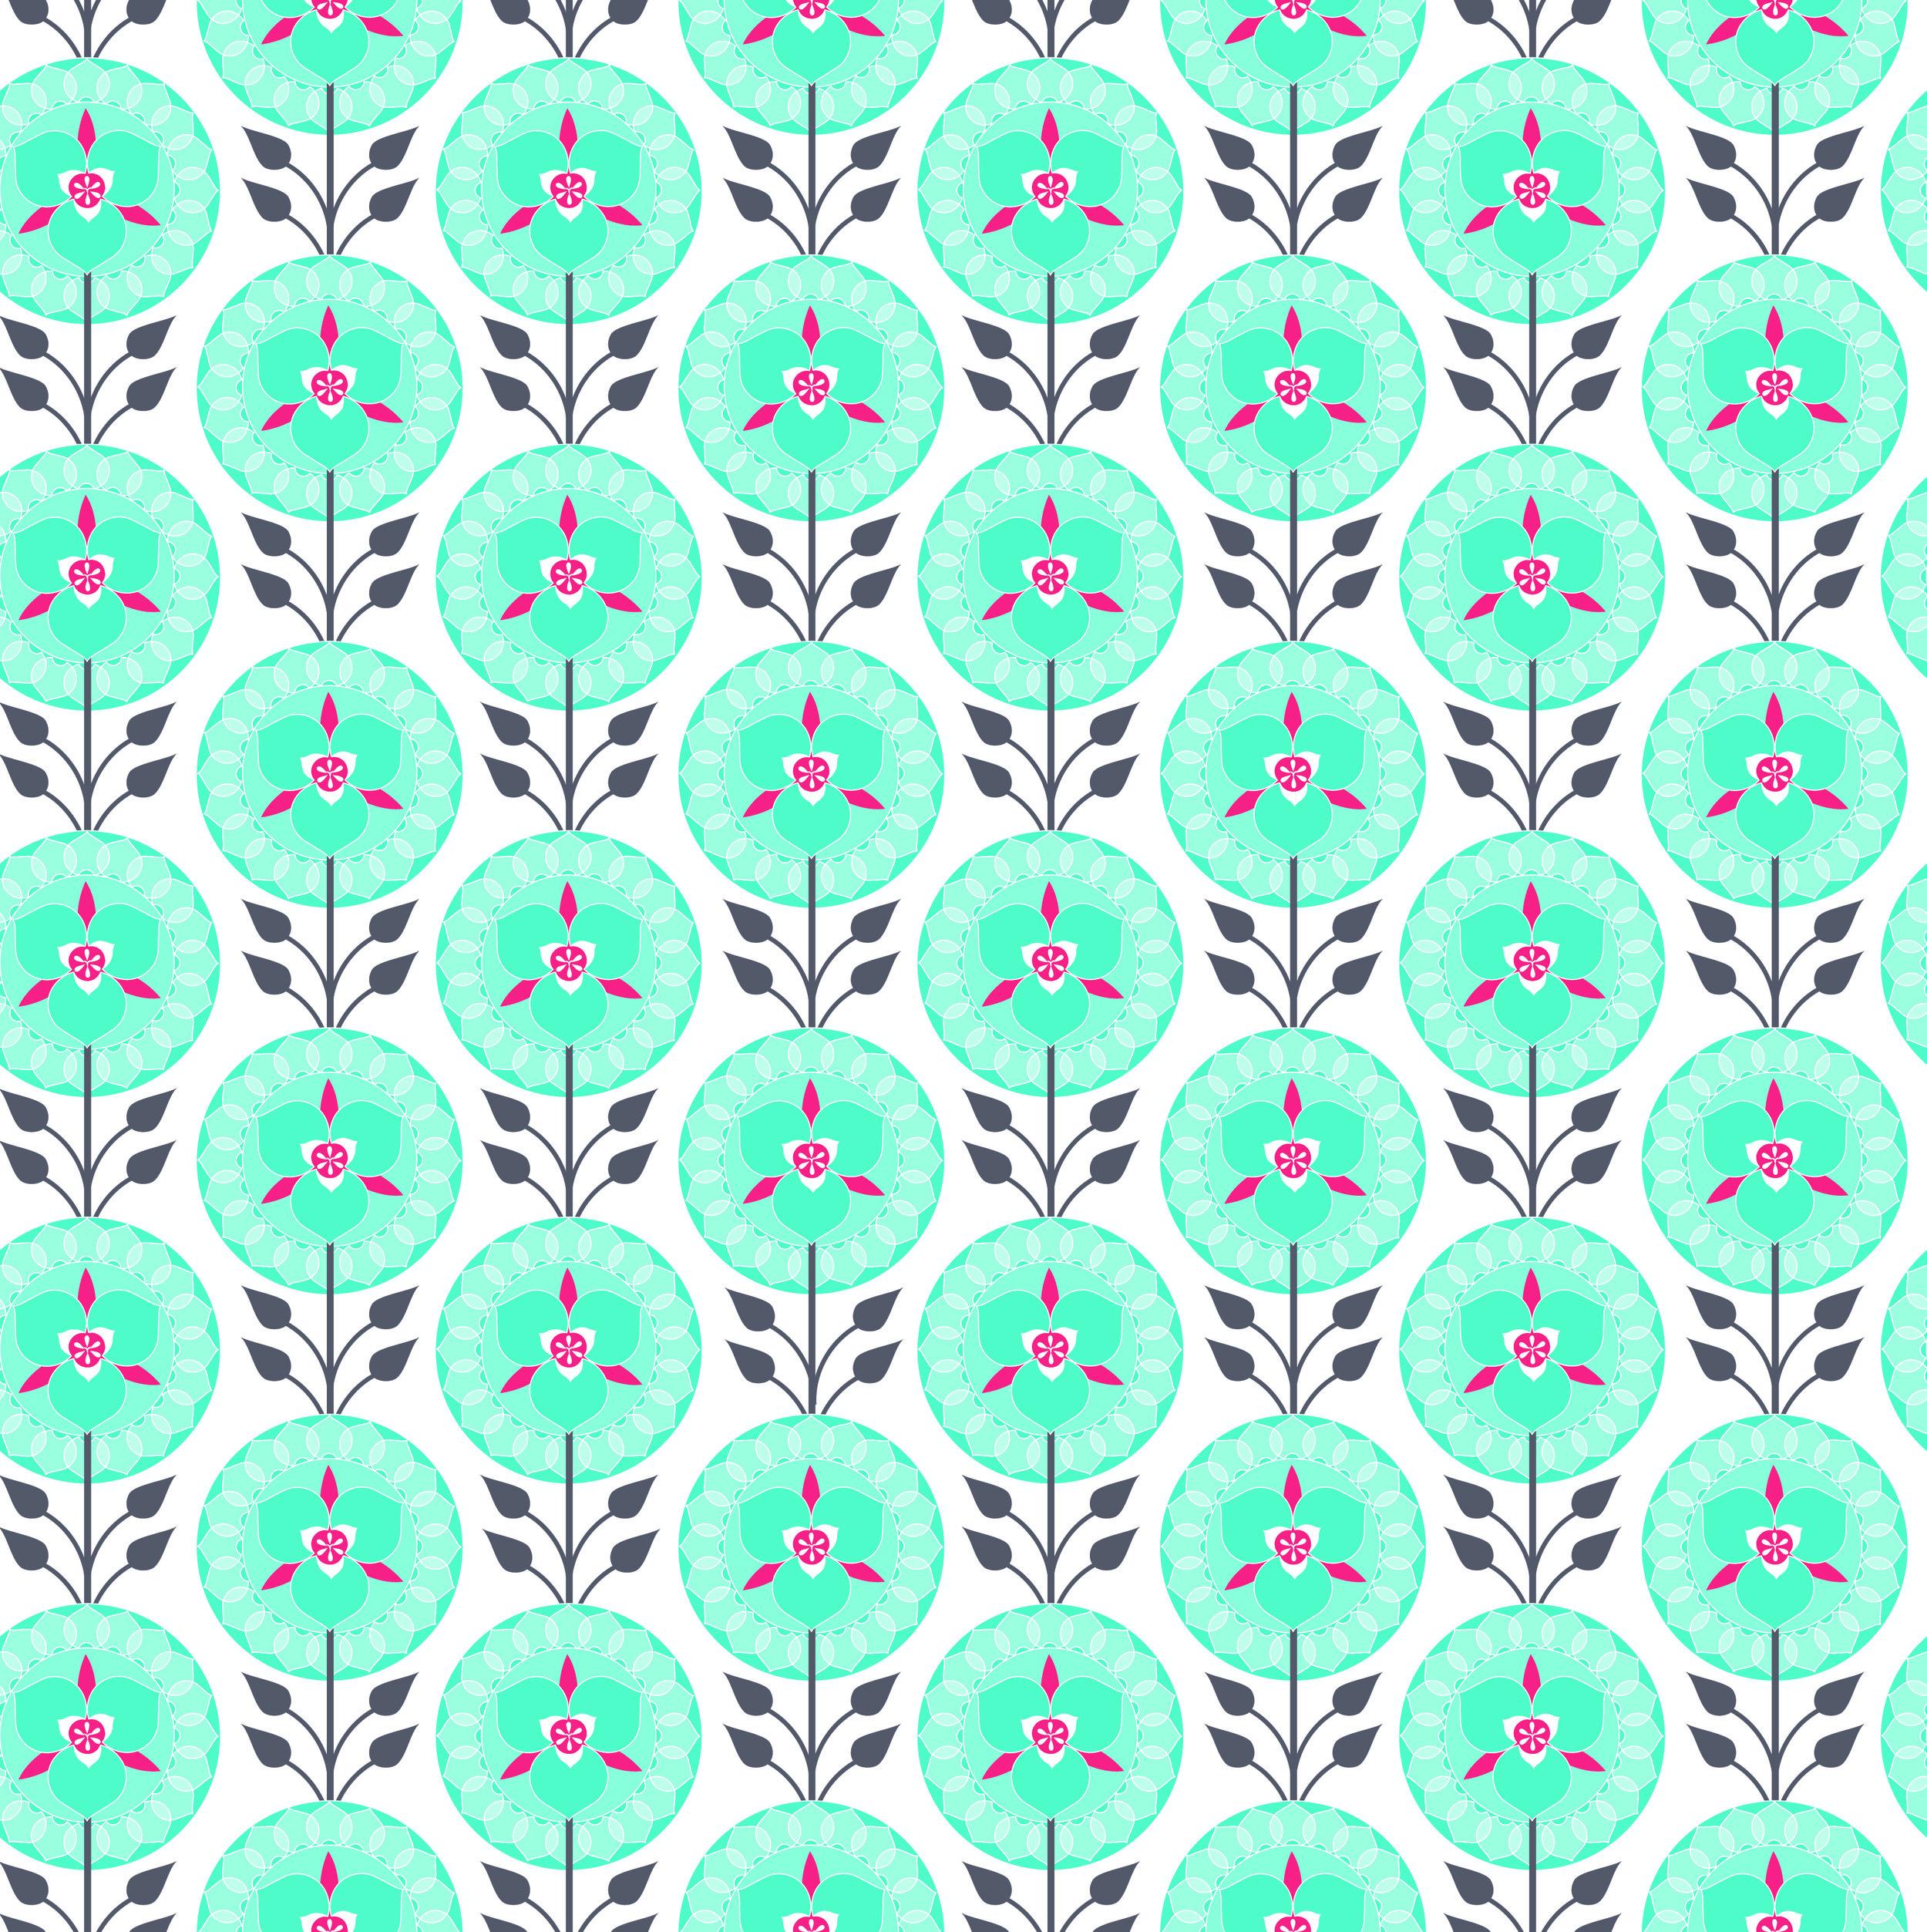 sego lilly medallion white grey and blue-01.jpg